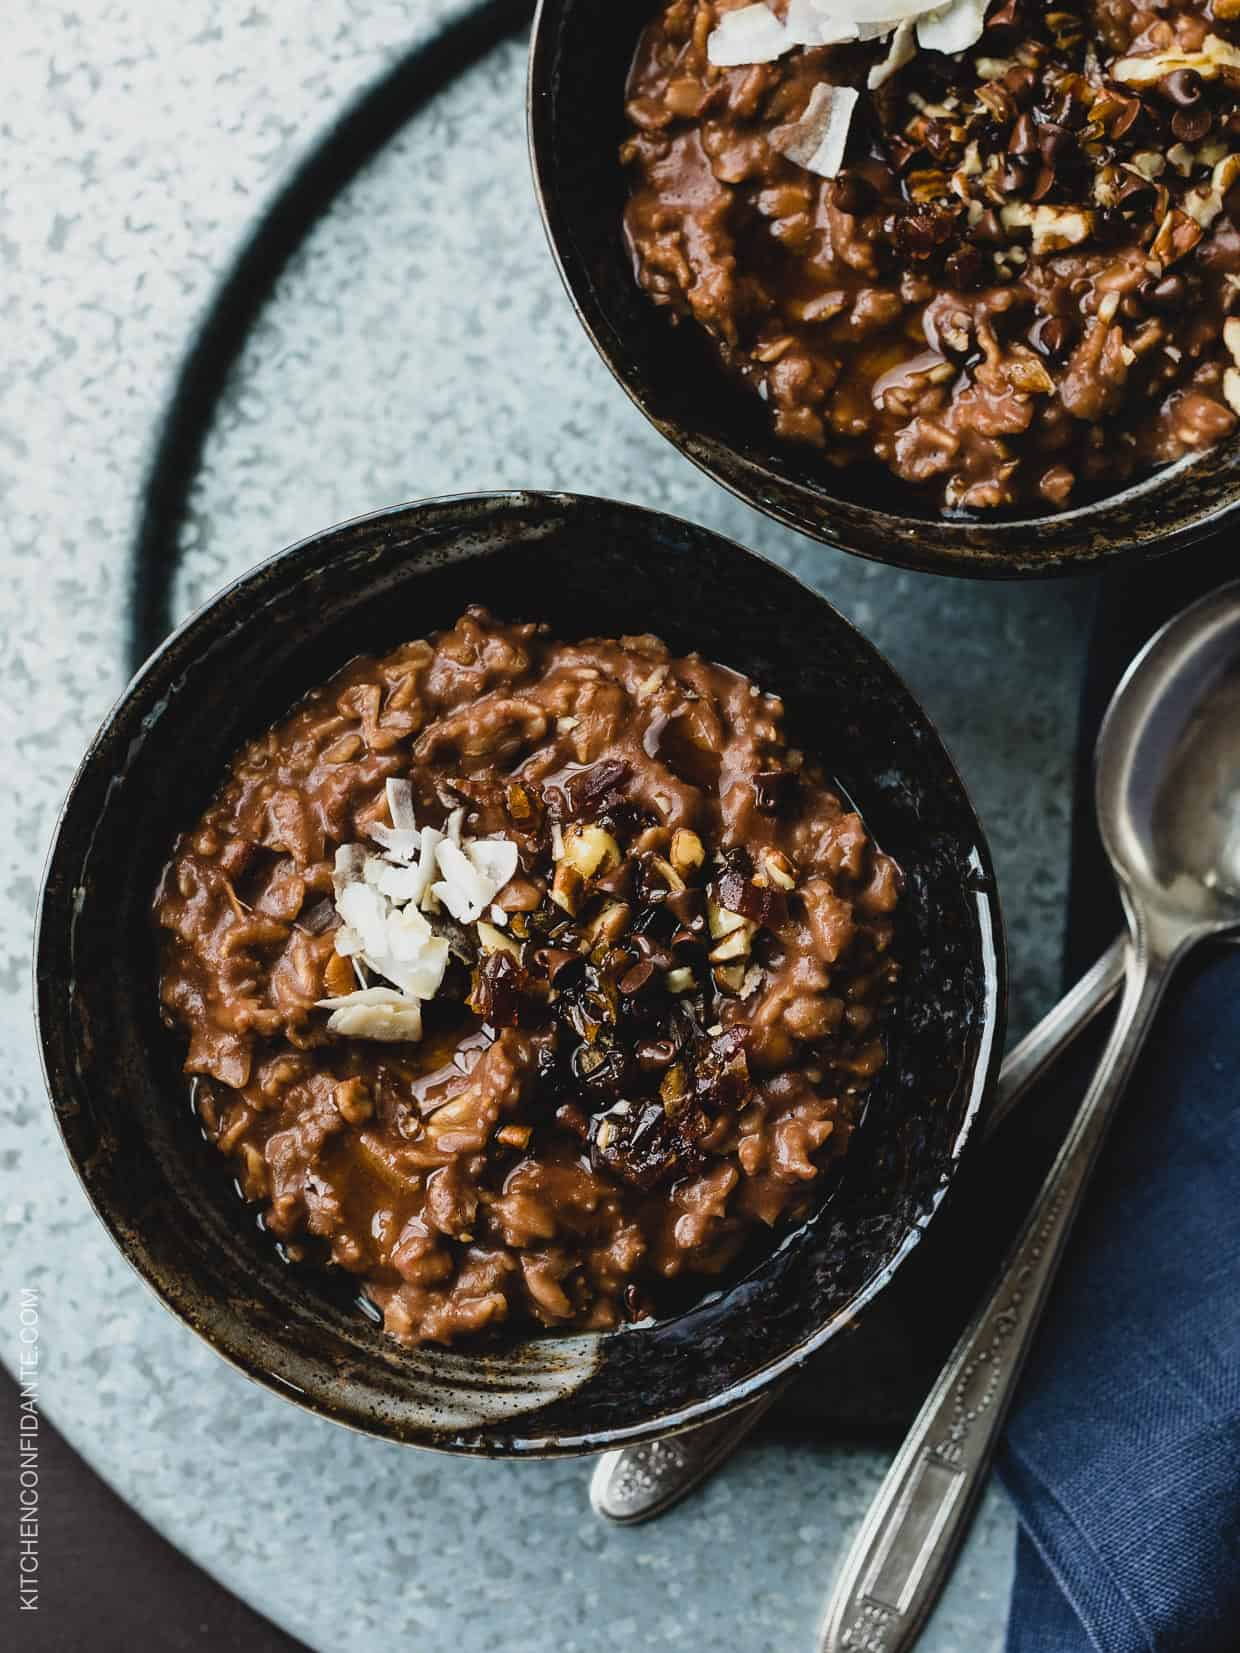 Chocolate Coconut Oat Porridge